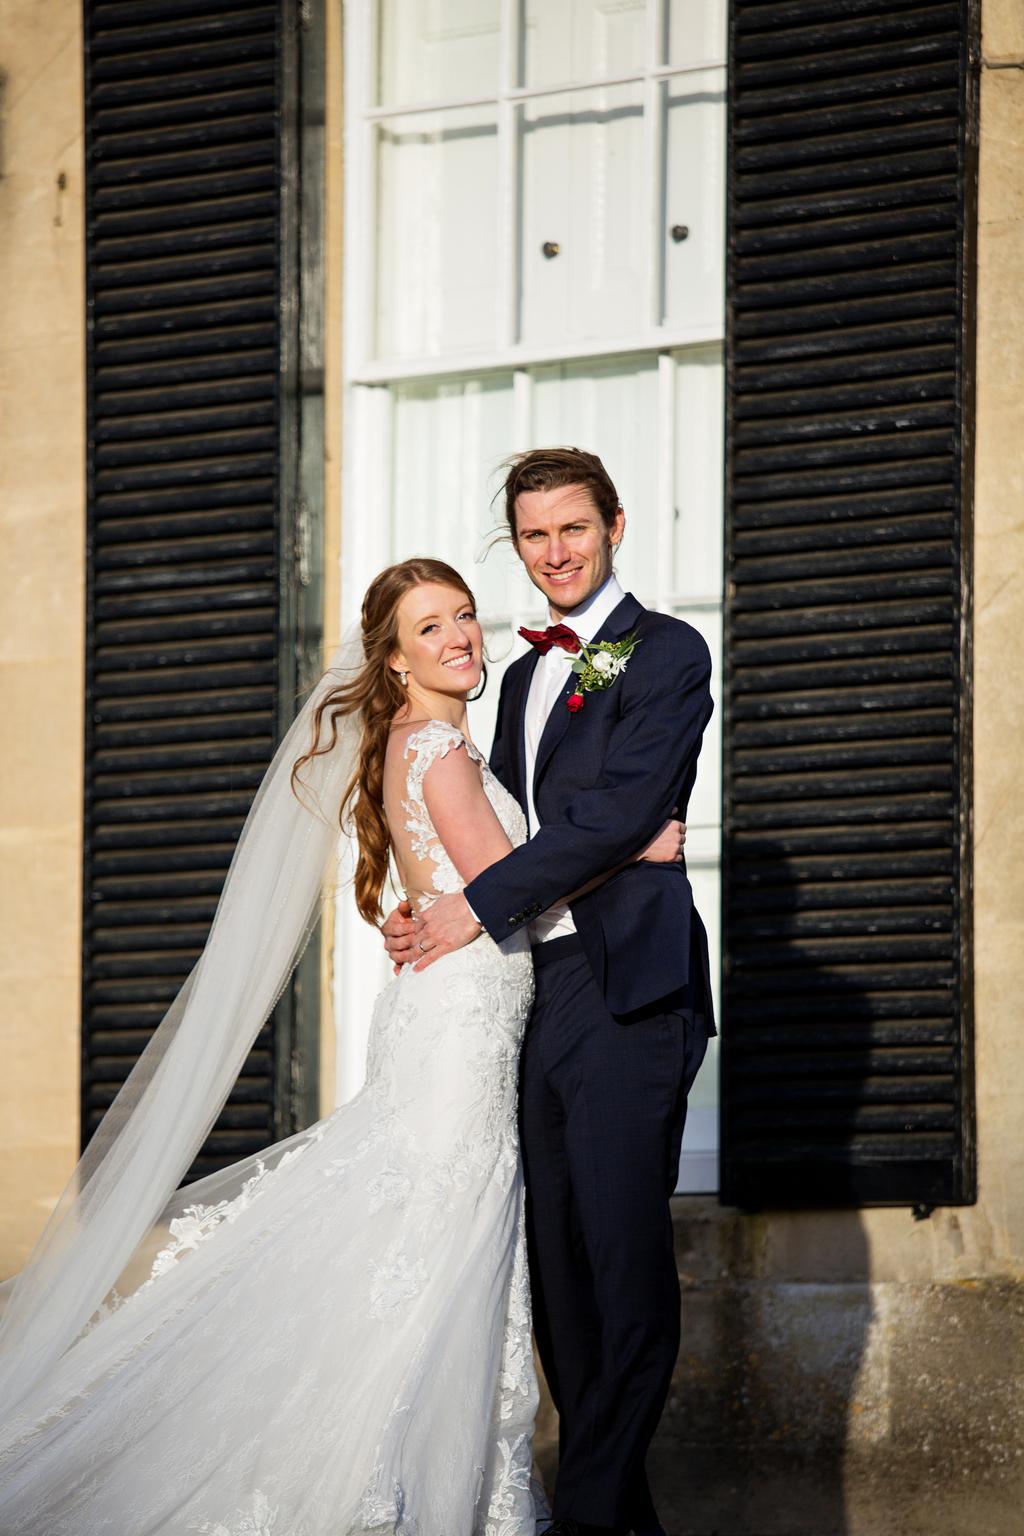 Real wedding in 2020 by Bristol wedding photographer Martin Dabek on English-Wedding.com